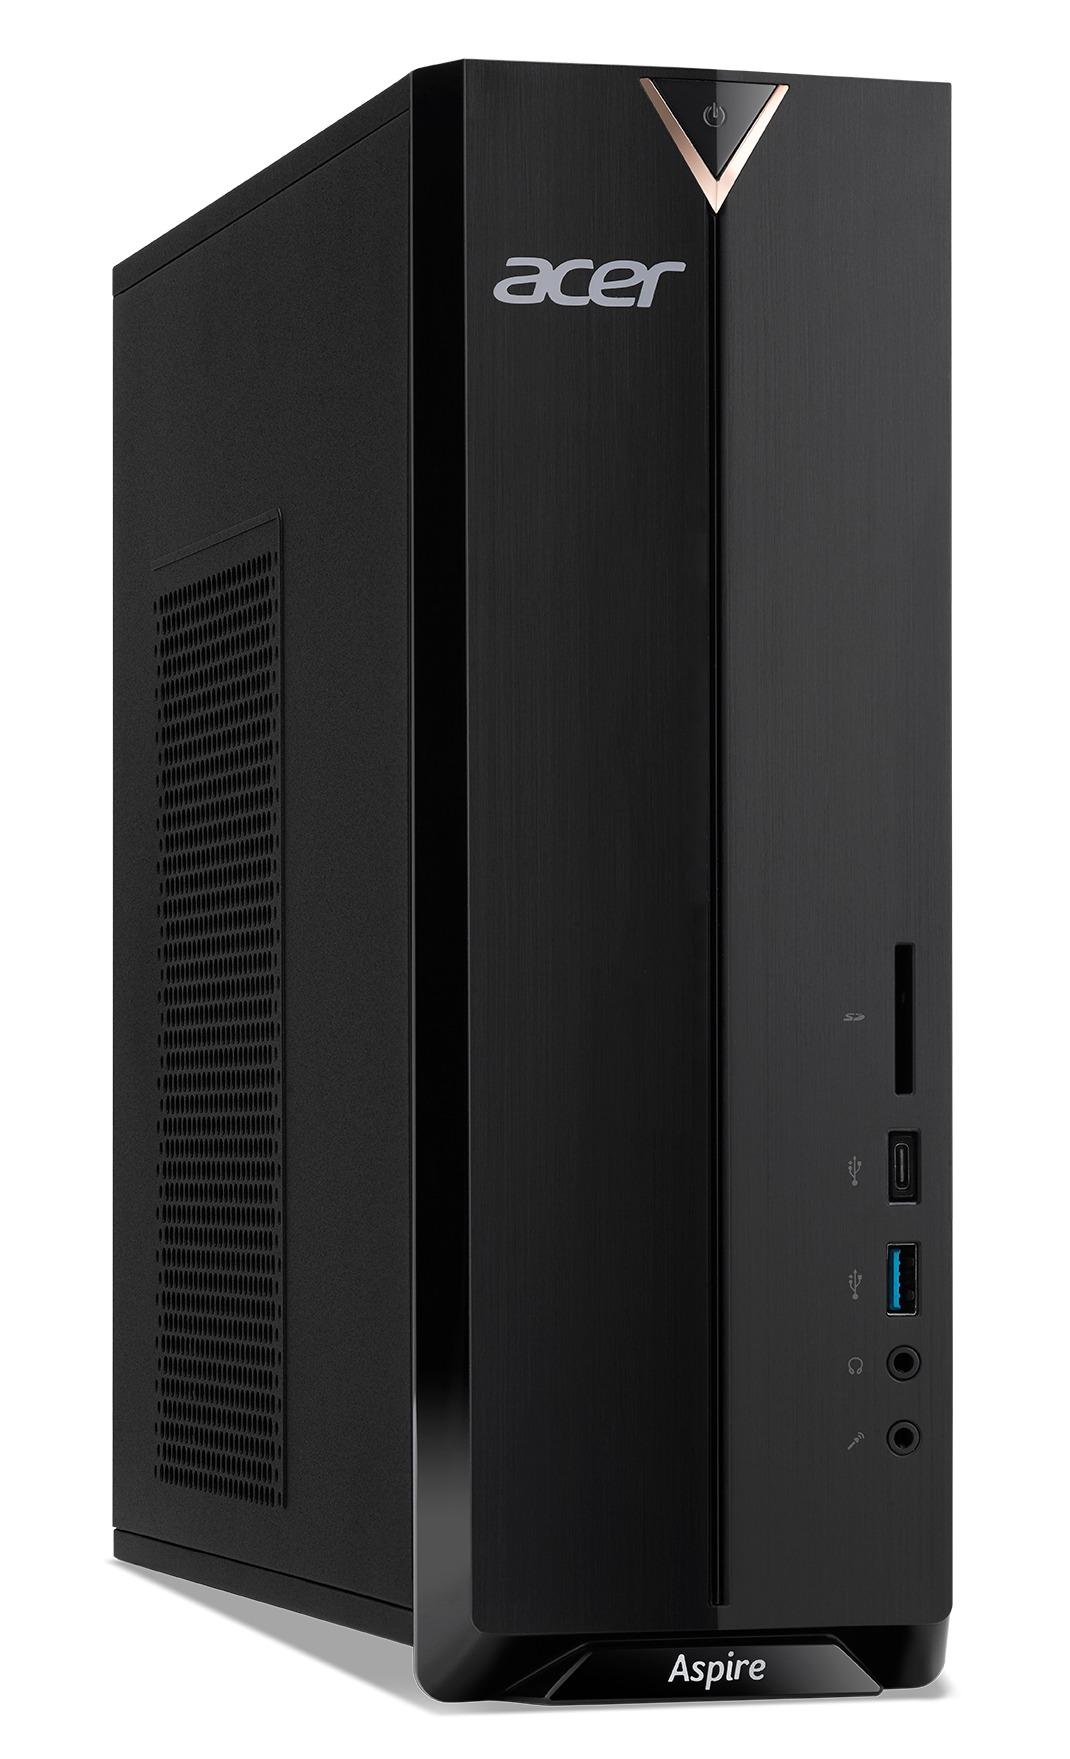 Acer Aspire XC-895 I4216 NL Desktop